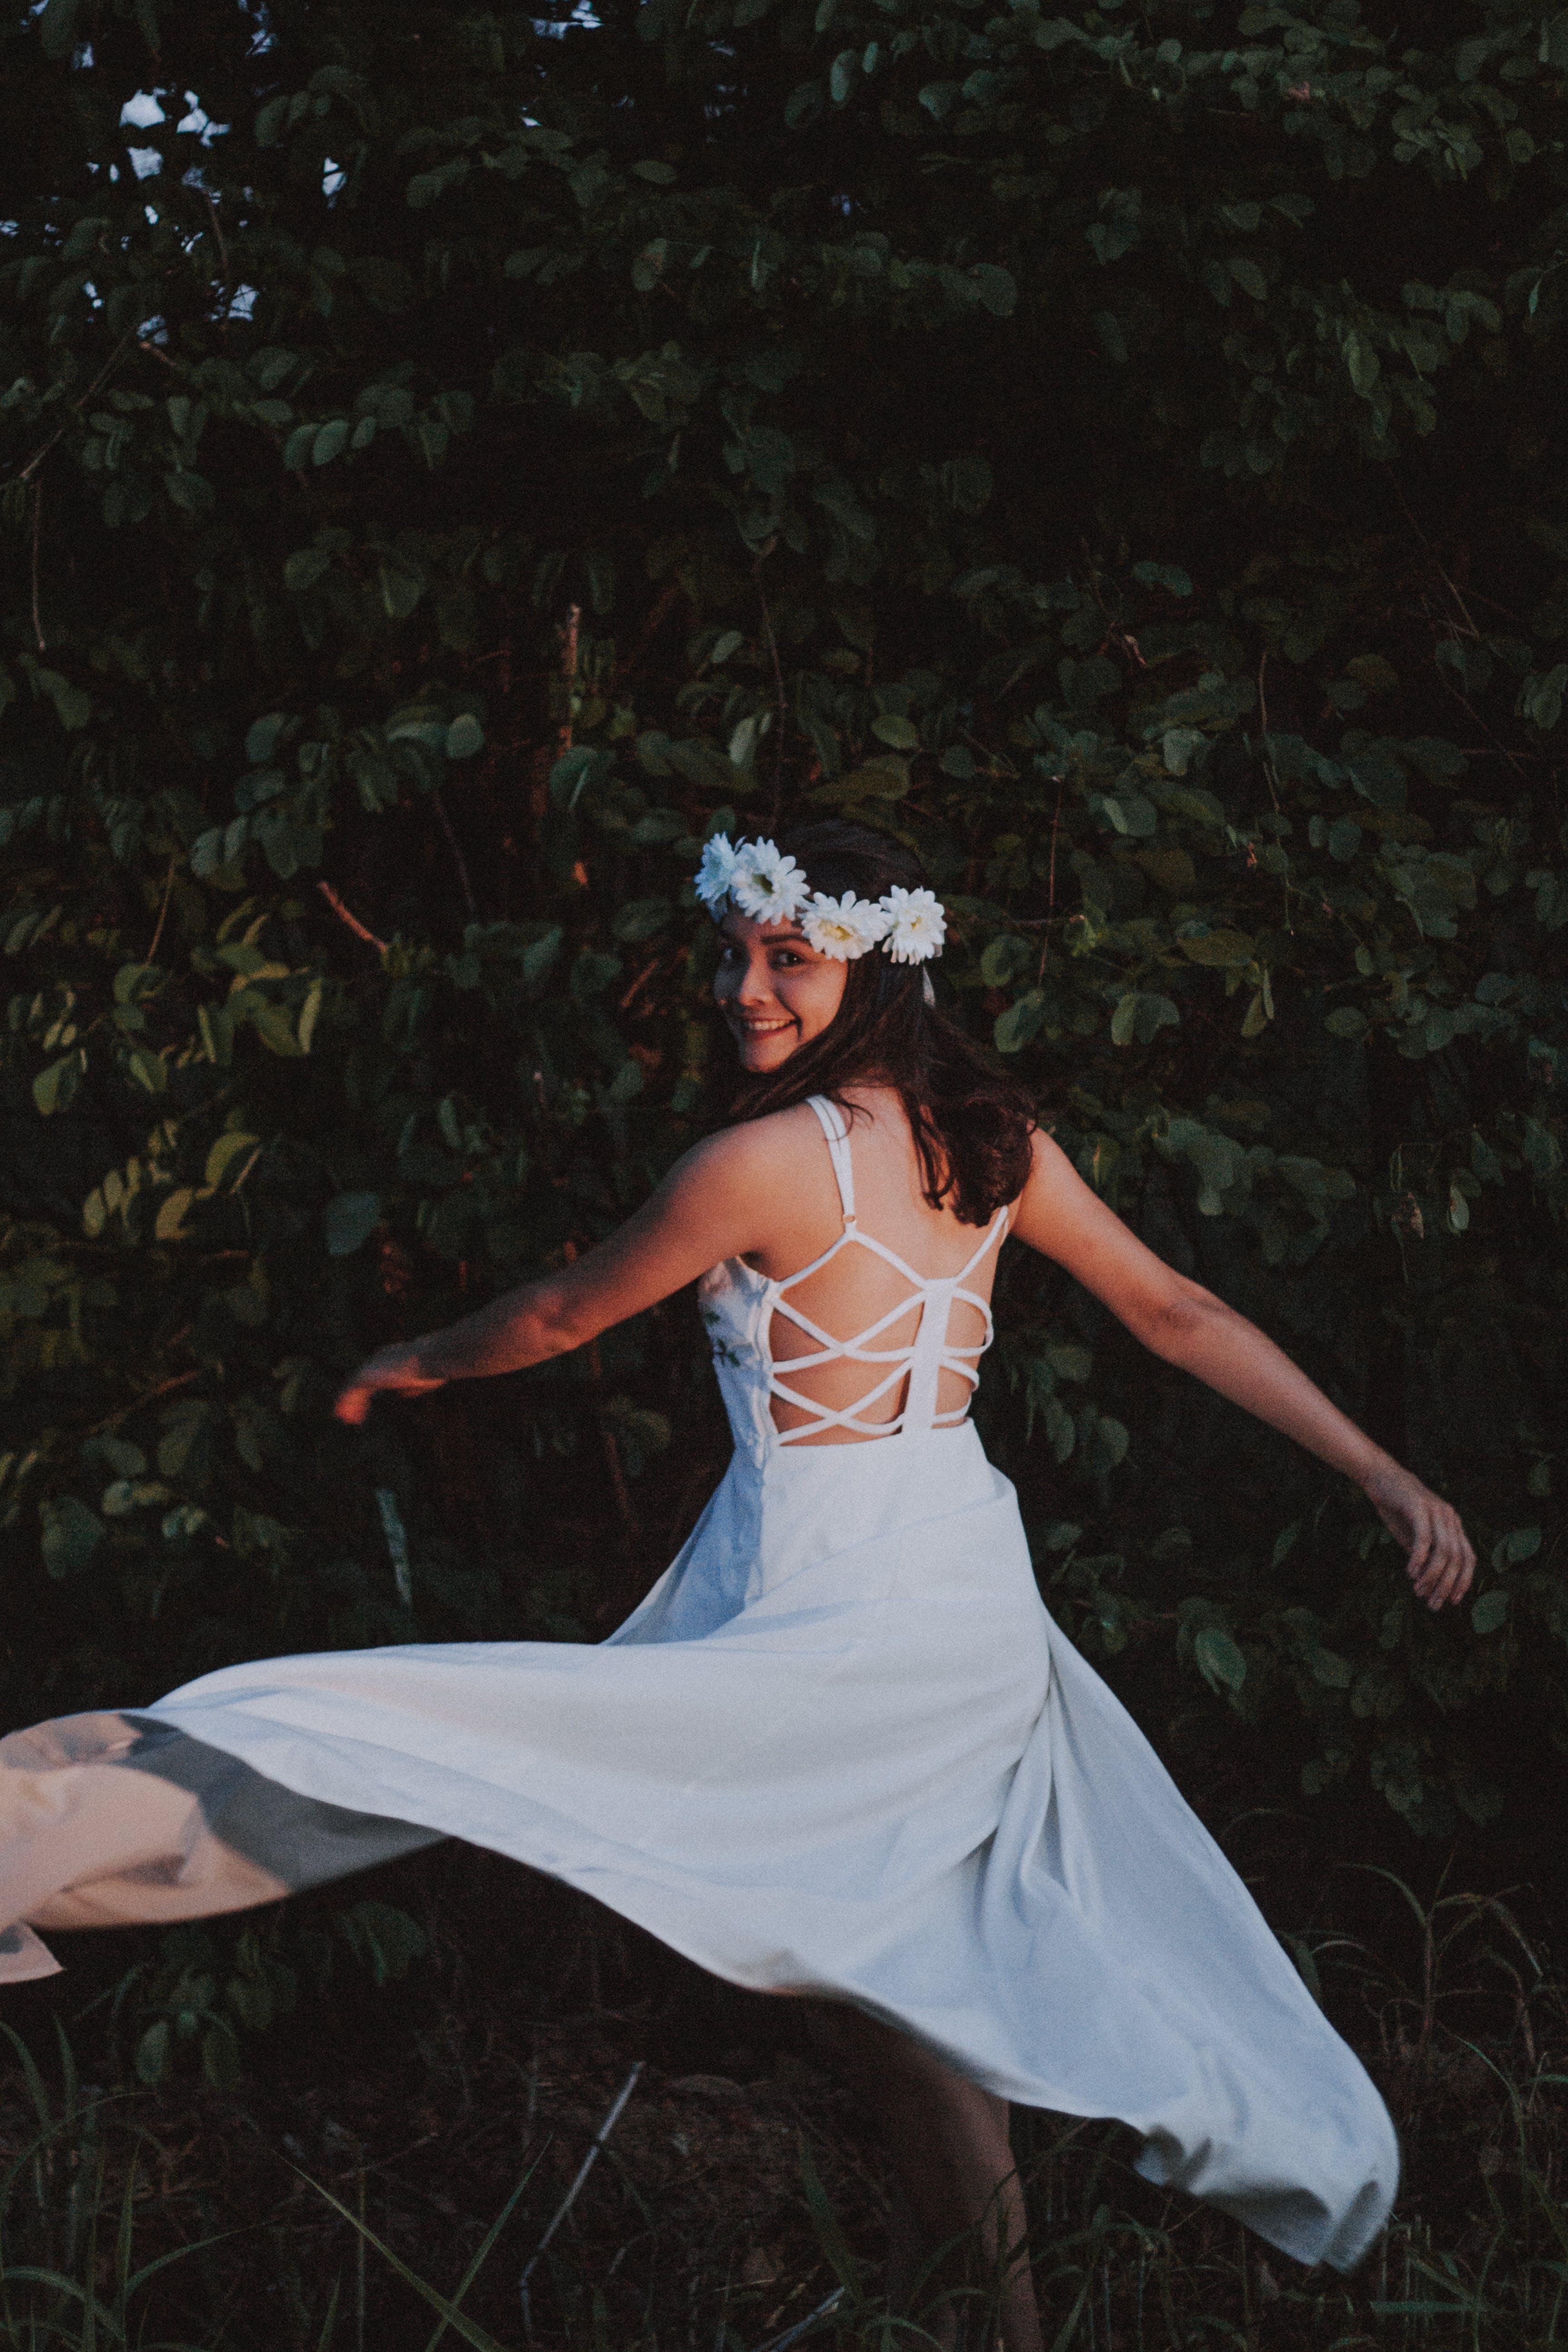 Woman Wearing White Backless Dress Dancing